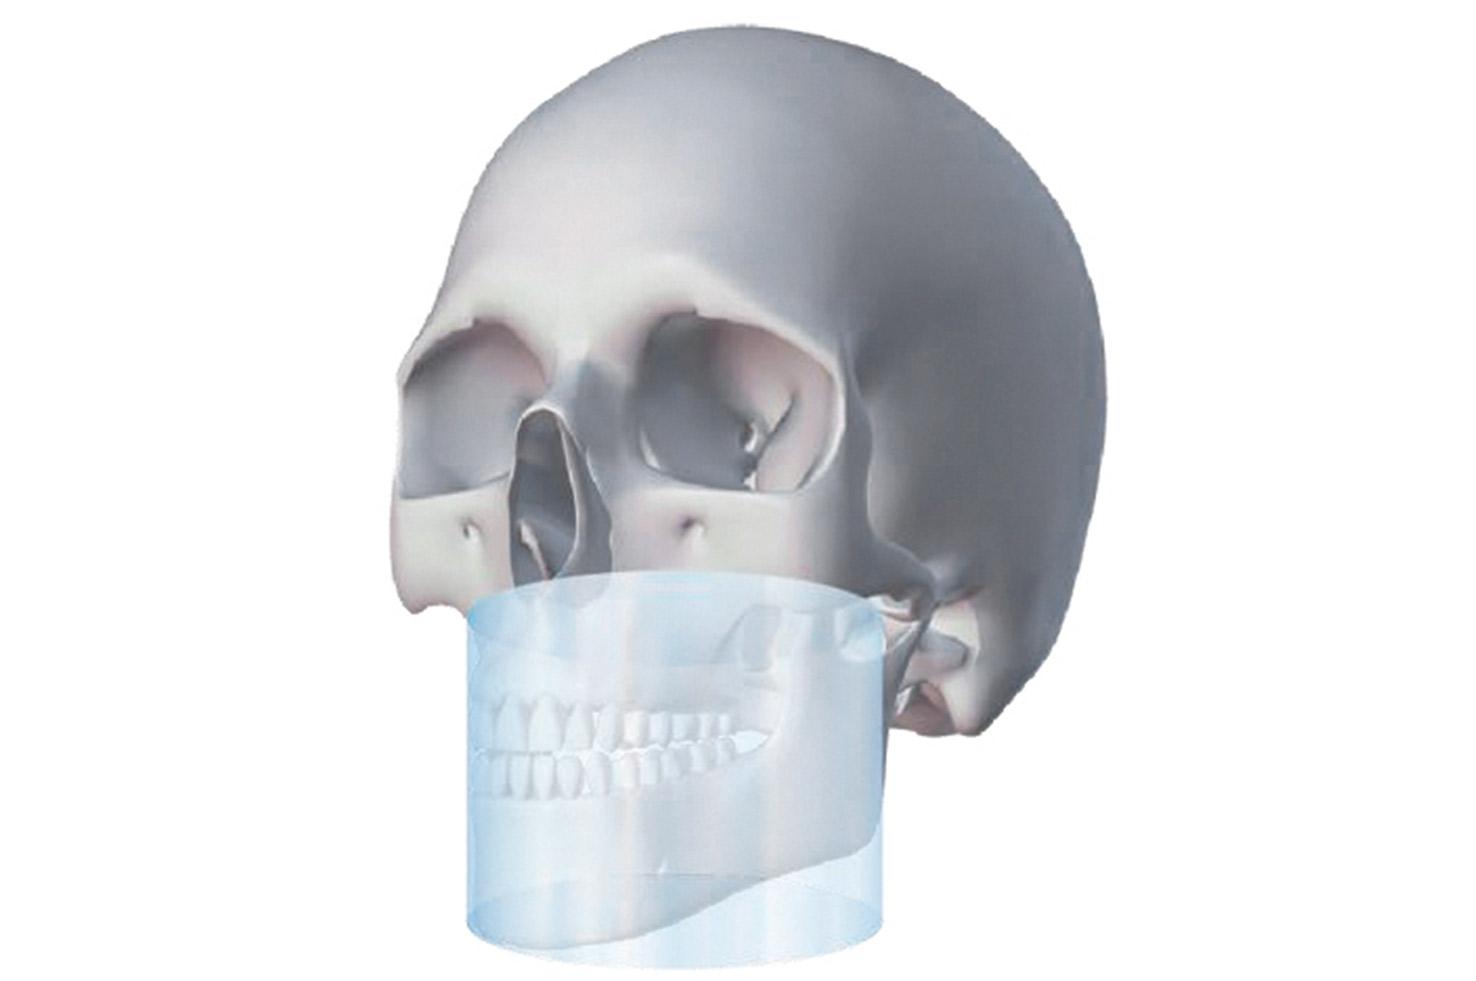 Praxis Dr. Wardak Kronberg 3D Roentgen